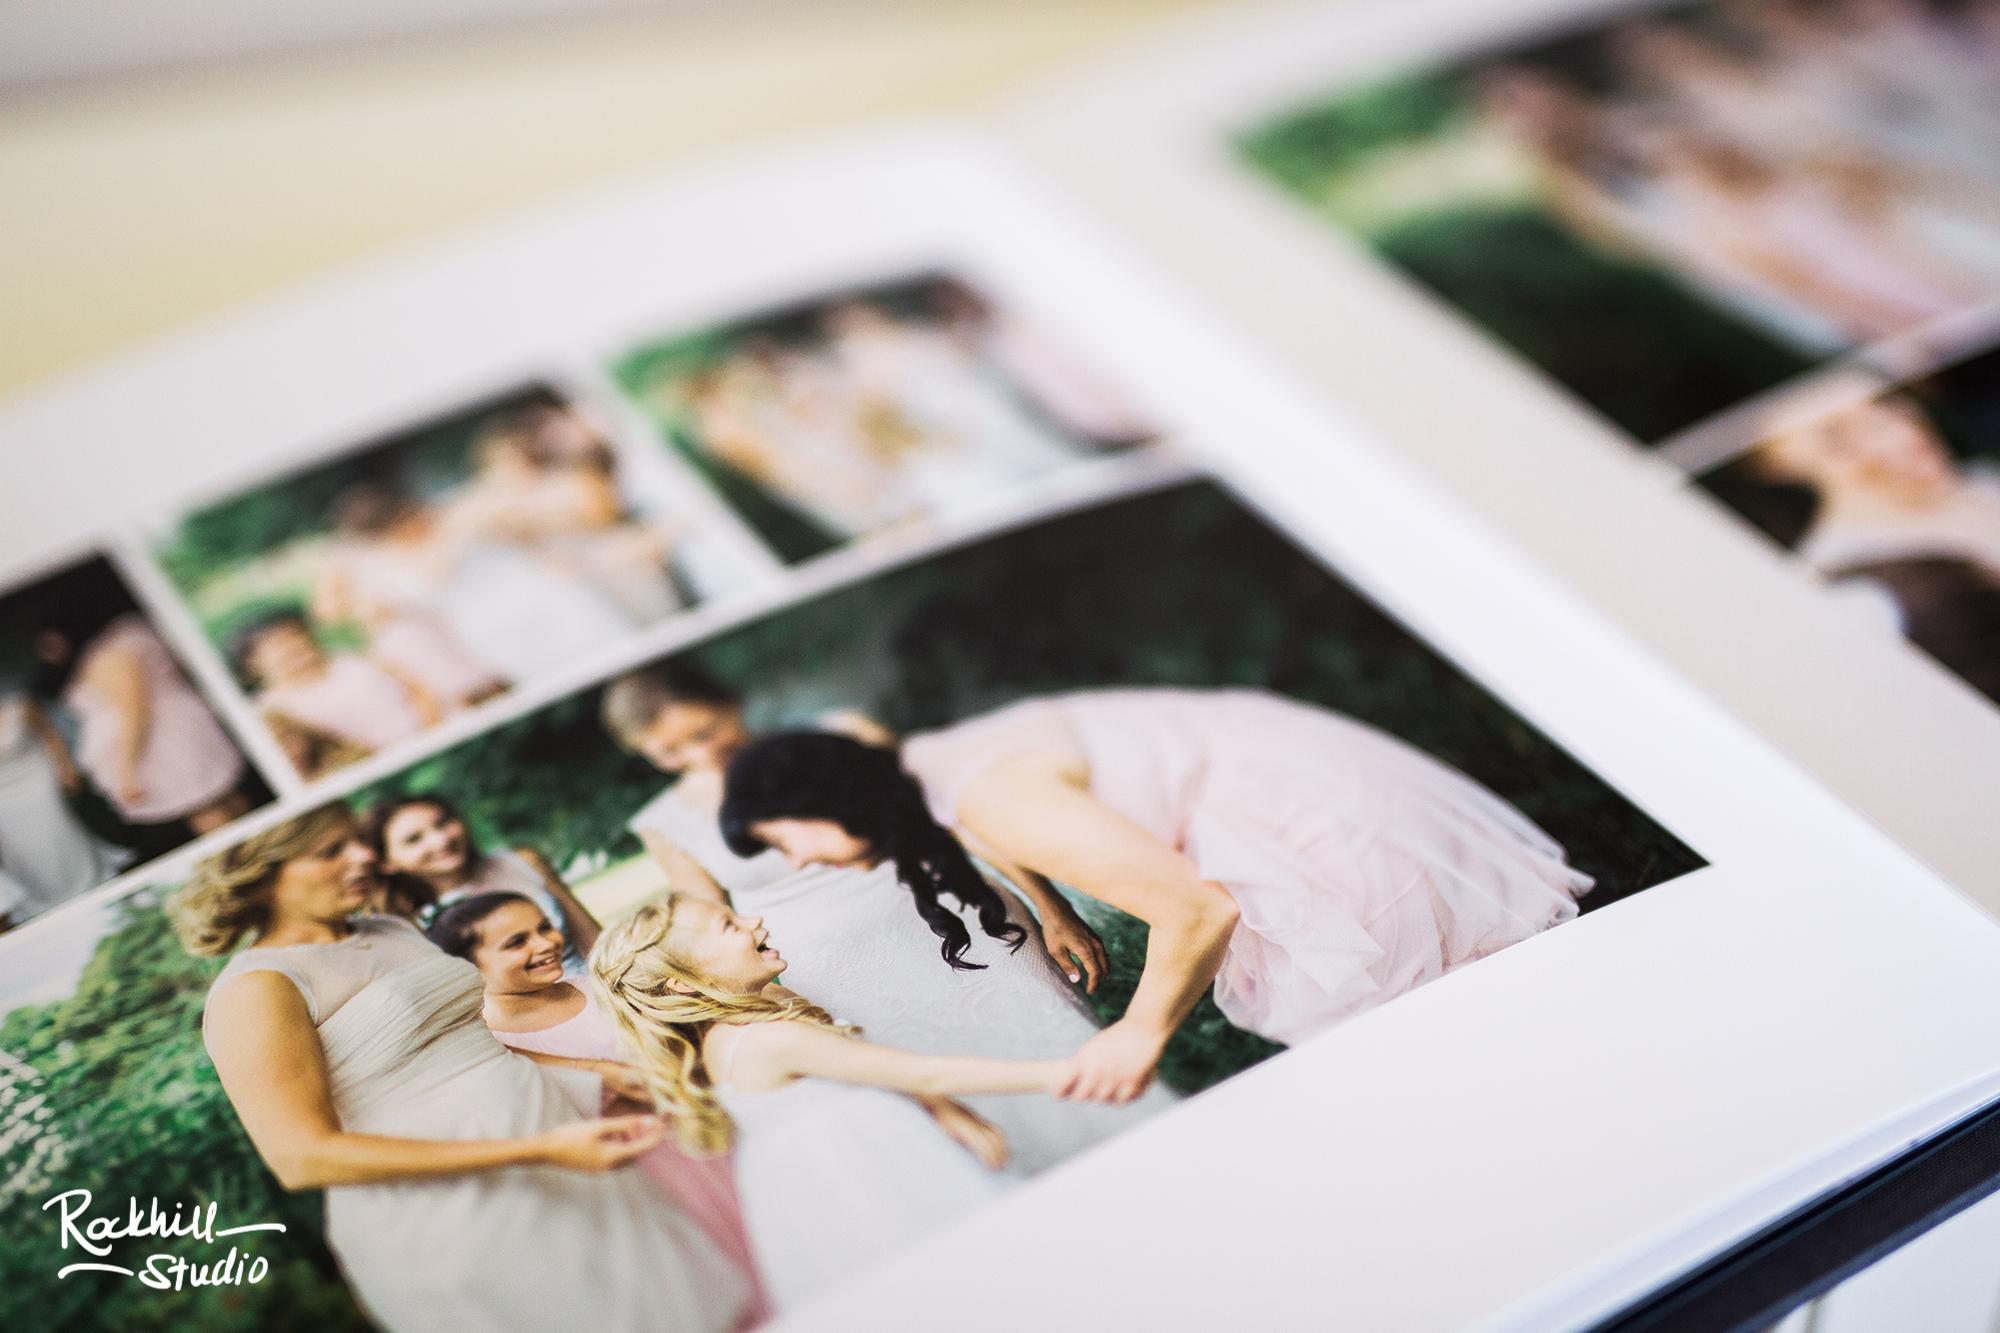 rockhill-wedding-photography-album-michigan-4.jpg